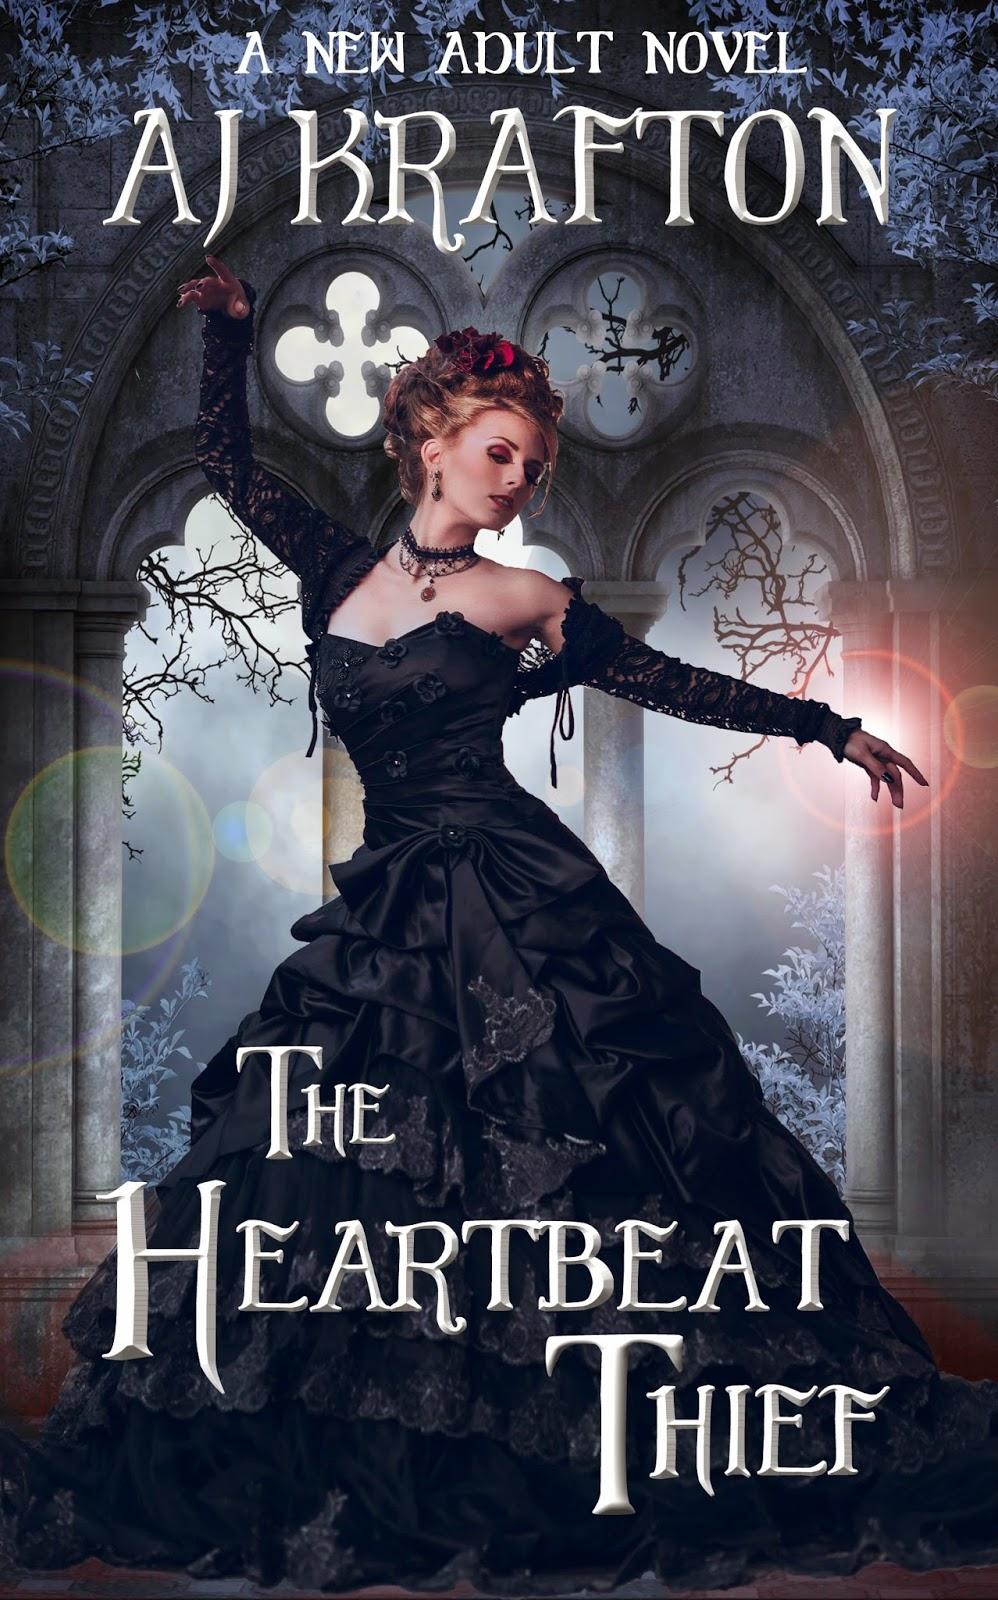 paranormal, dark fantasy, new adult, fiction, cover art, Victorian, Jane Austen, Edgar Allan Poe